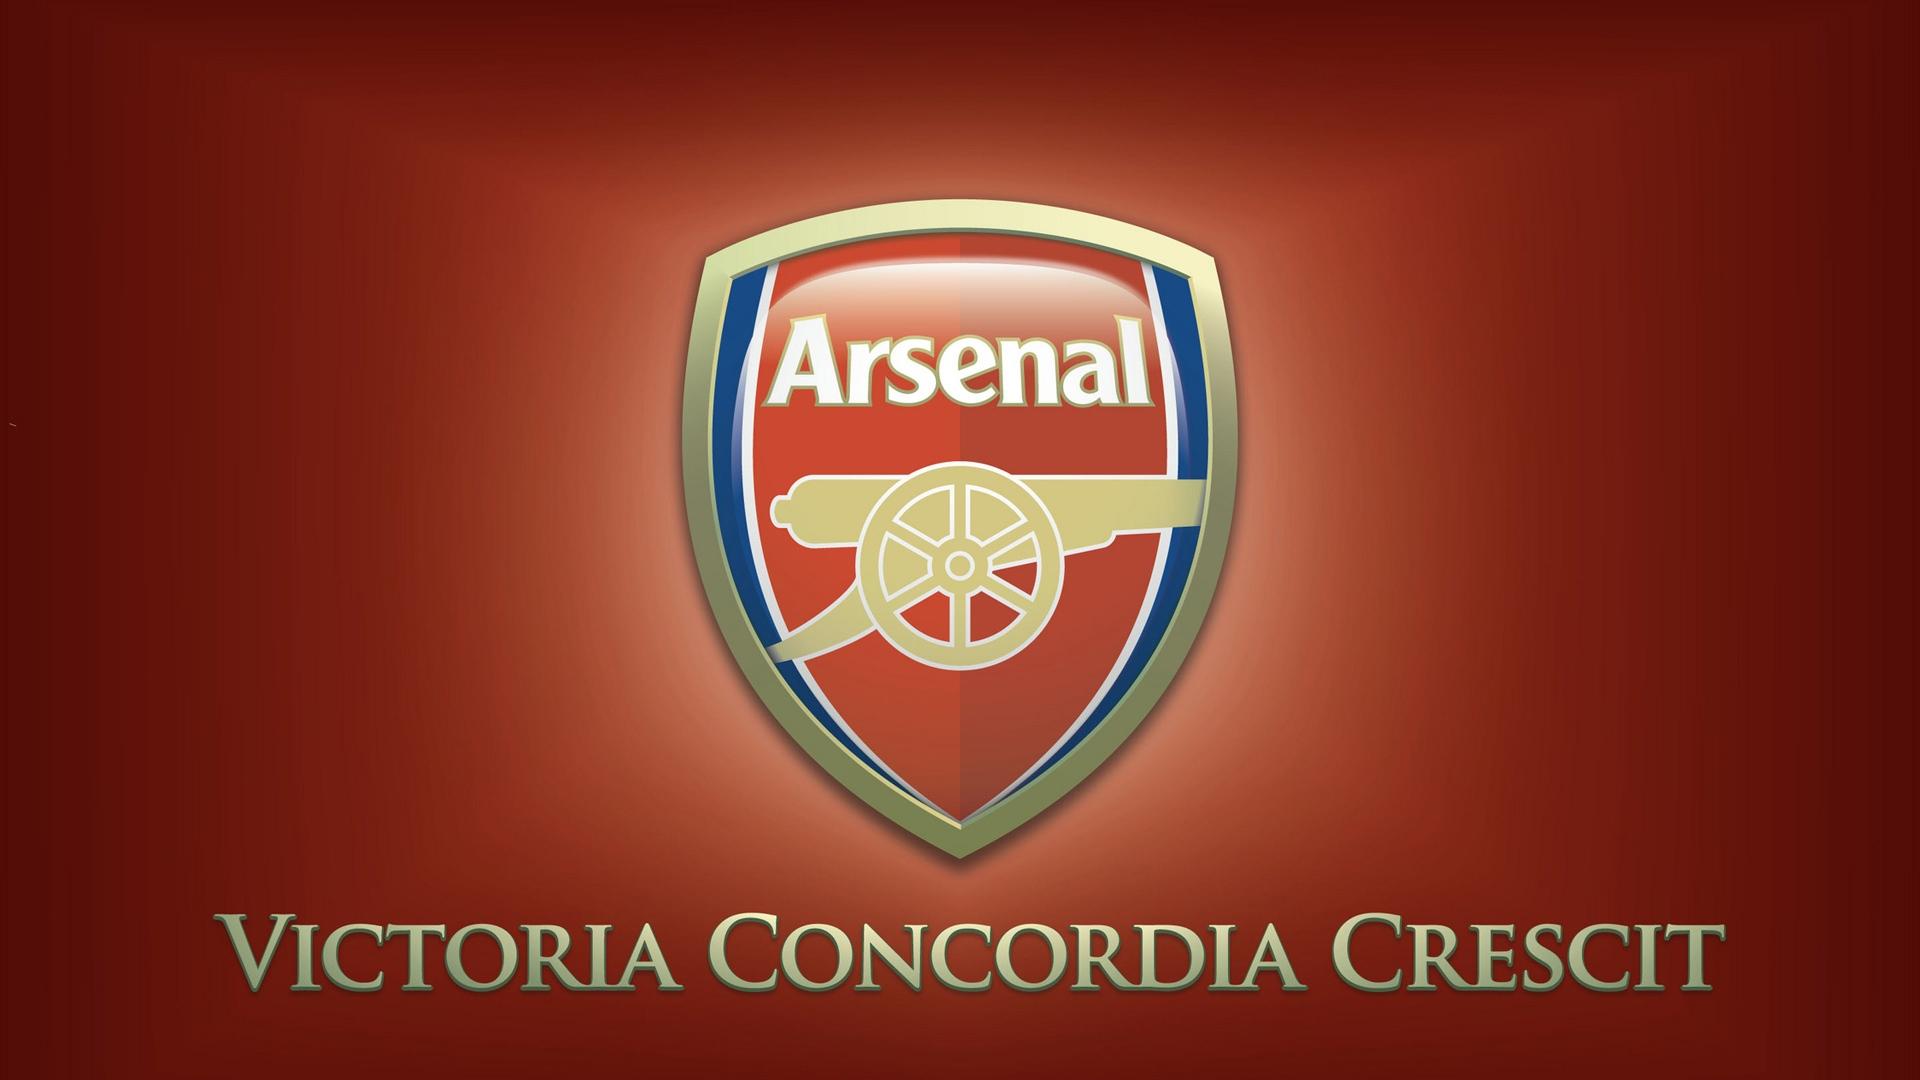 Download Wallpaper 1920x1080 Logo, Arsenal, Football Club